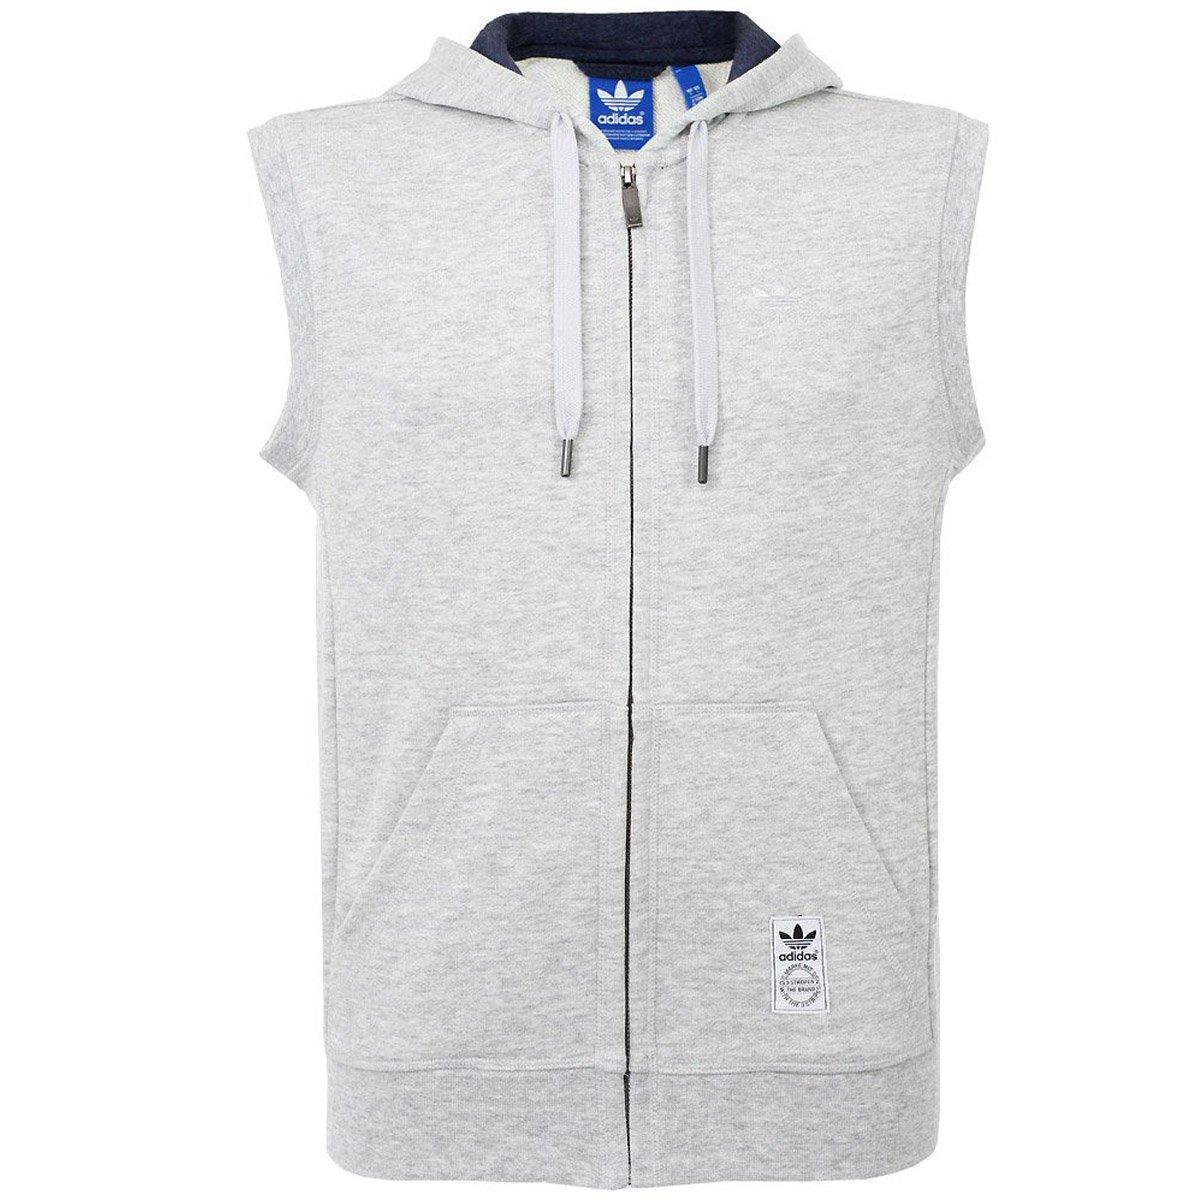 0dd30d8c45fee9 adidas Originals Mens PE Sleeveless Hoodie - Grey - X-Small  Amazon.co.uk   Sports   Outdoors